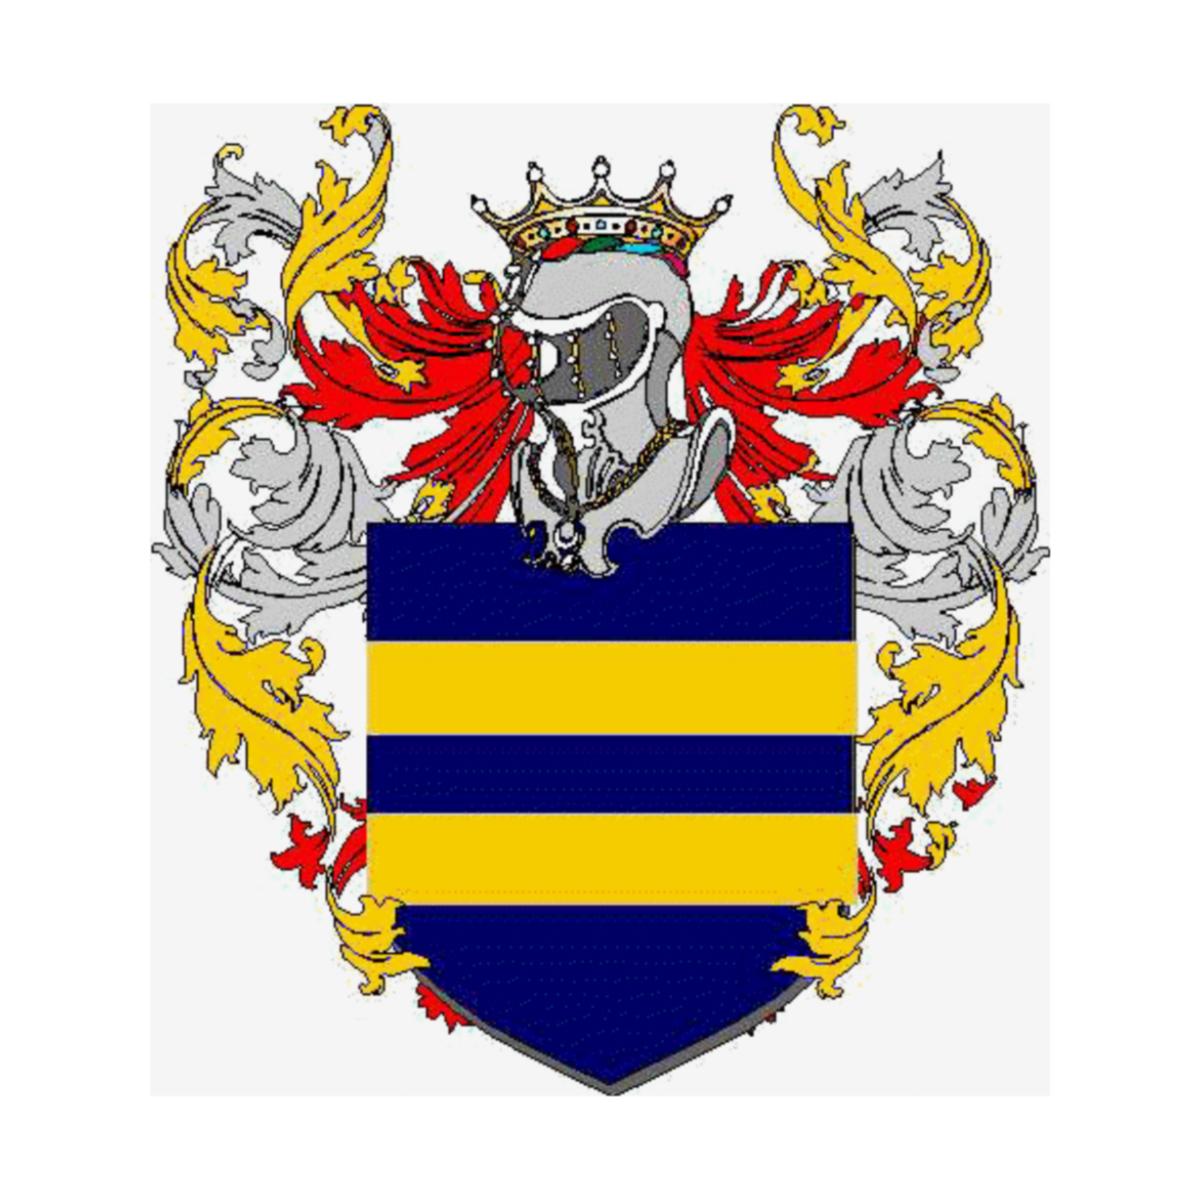 File:Escudo de Torrepadre.svg